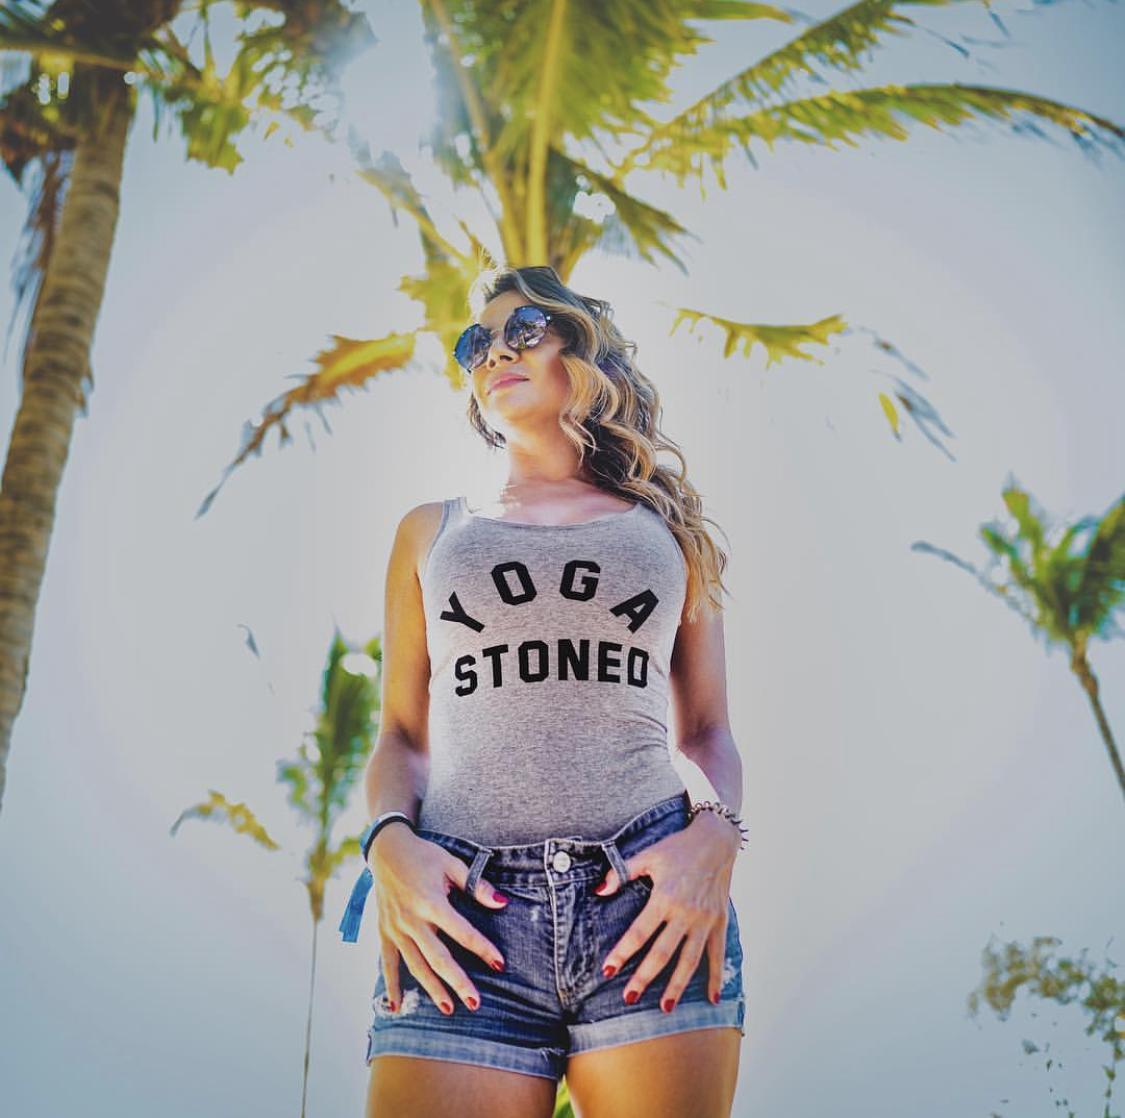 yoga stoned bodysuit